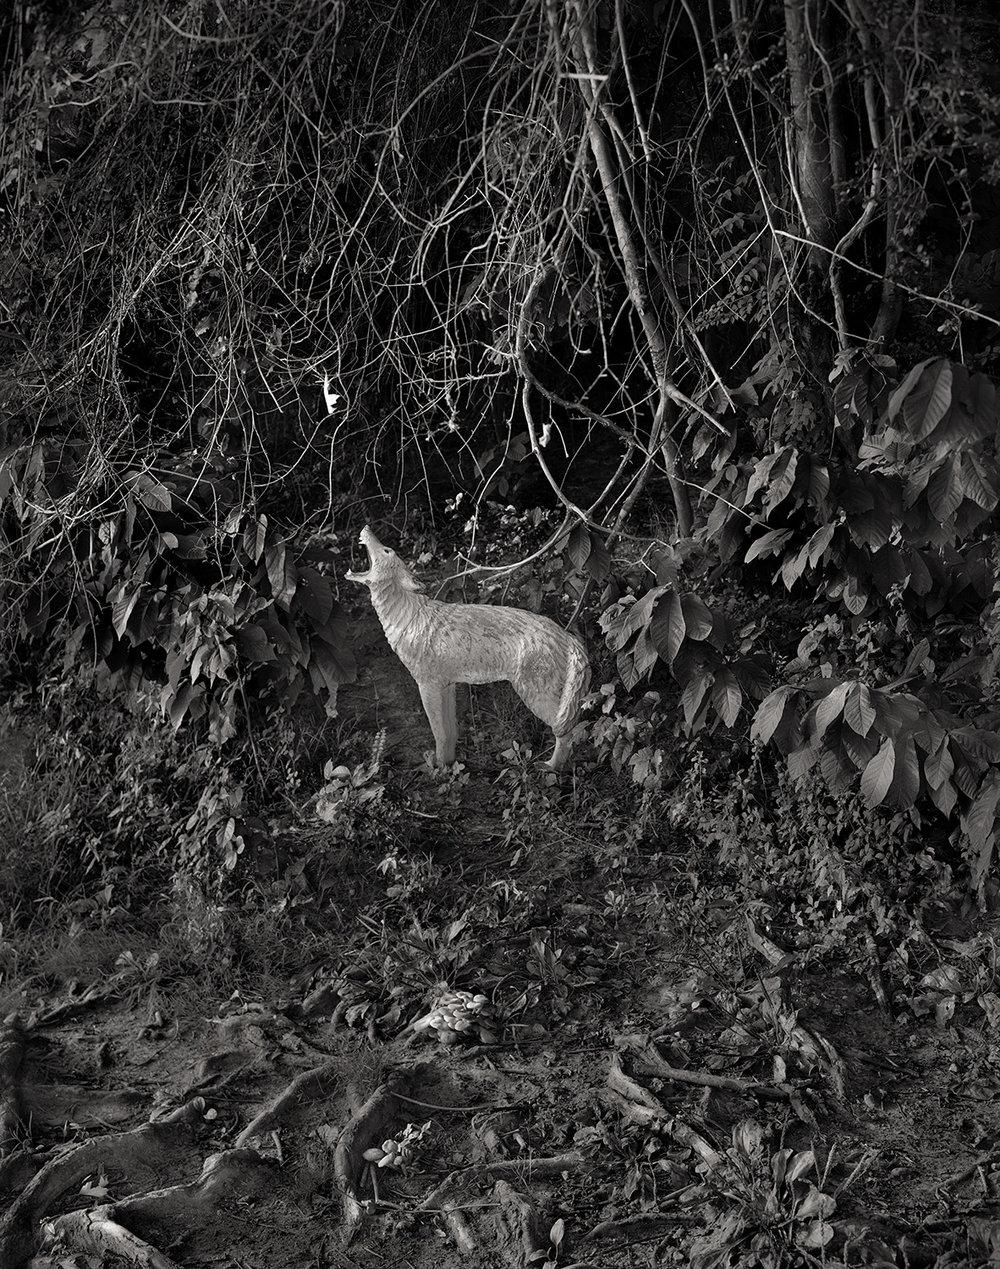 Wood's Coyote